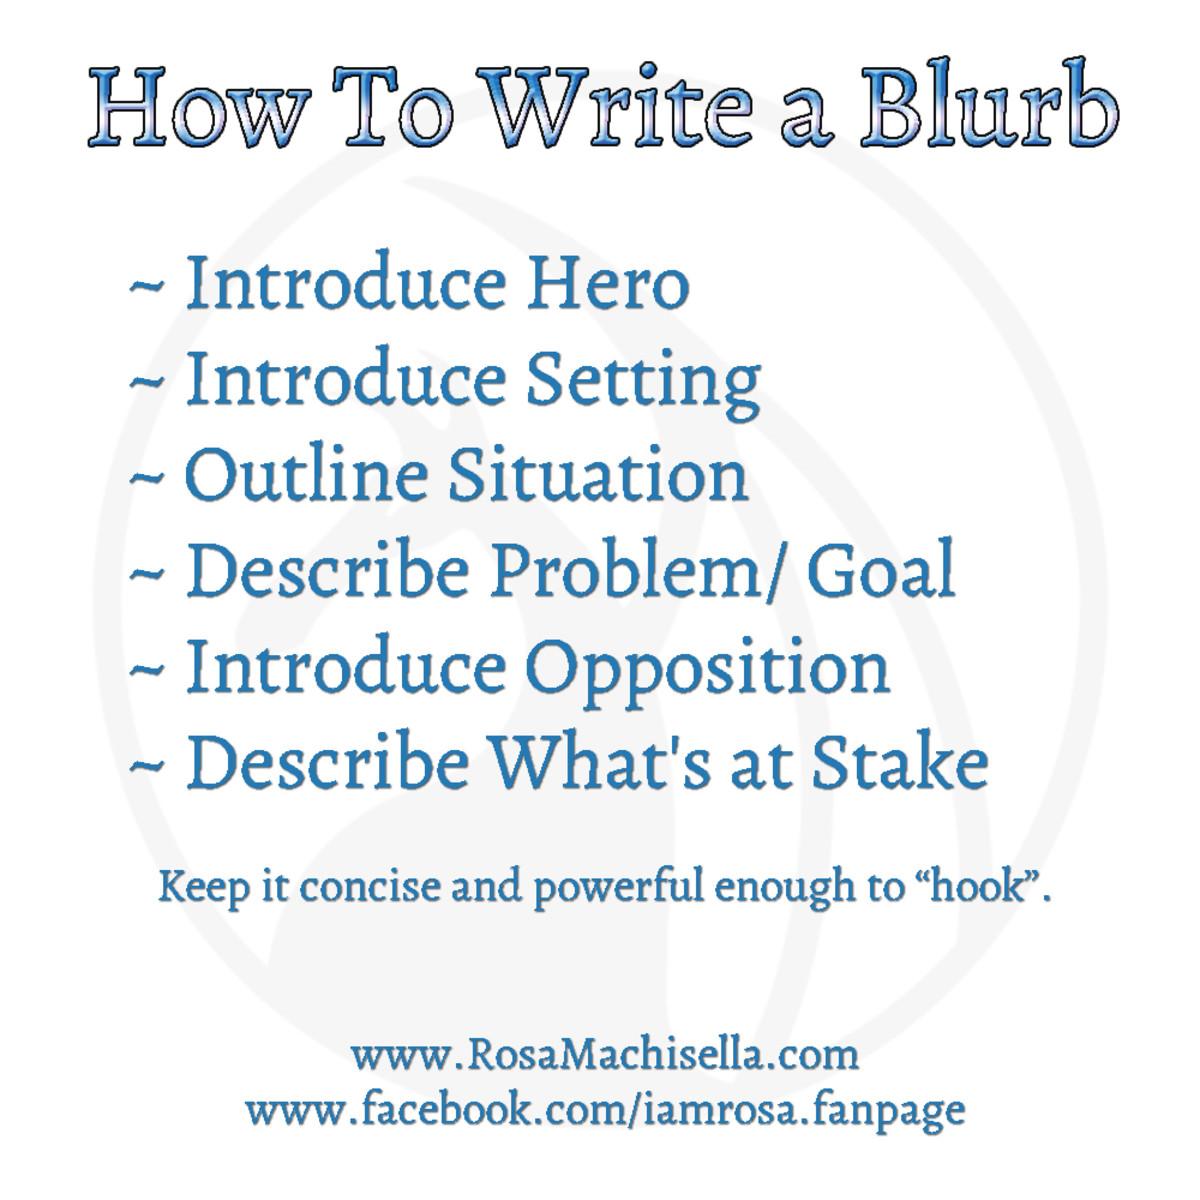 how-to-write-a-blurb